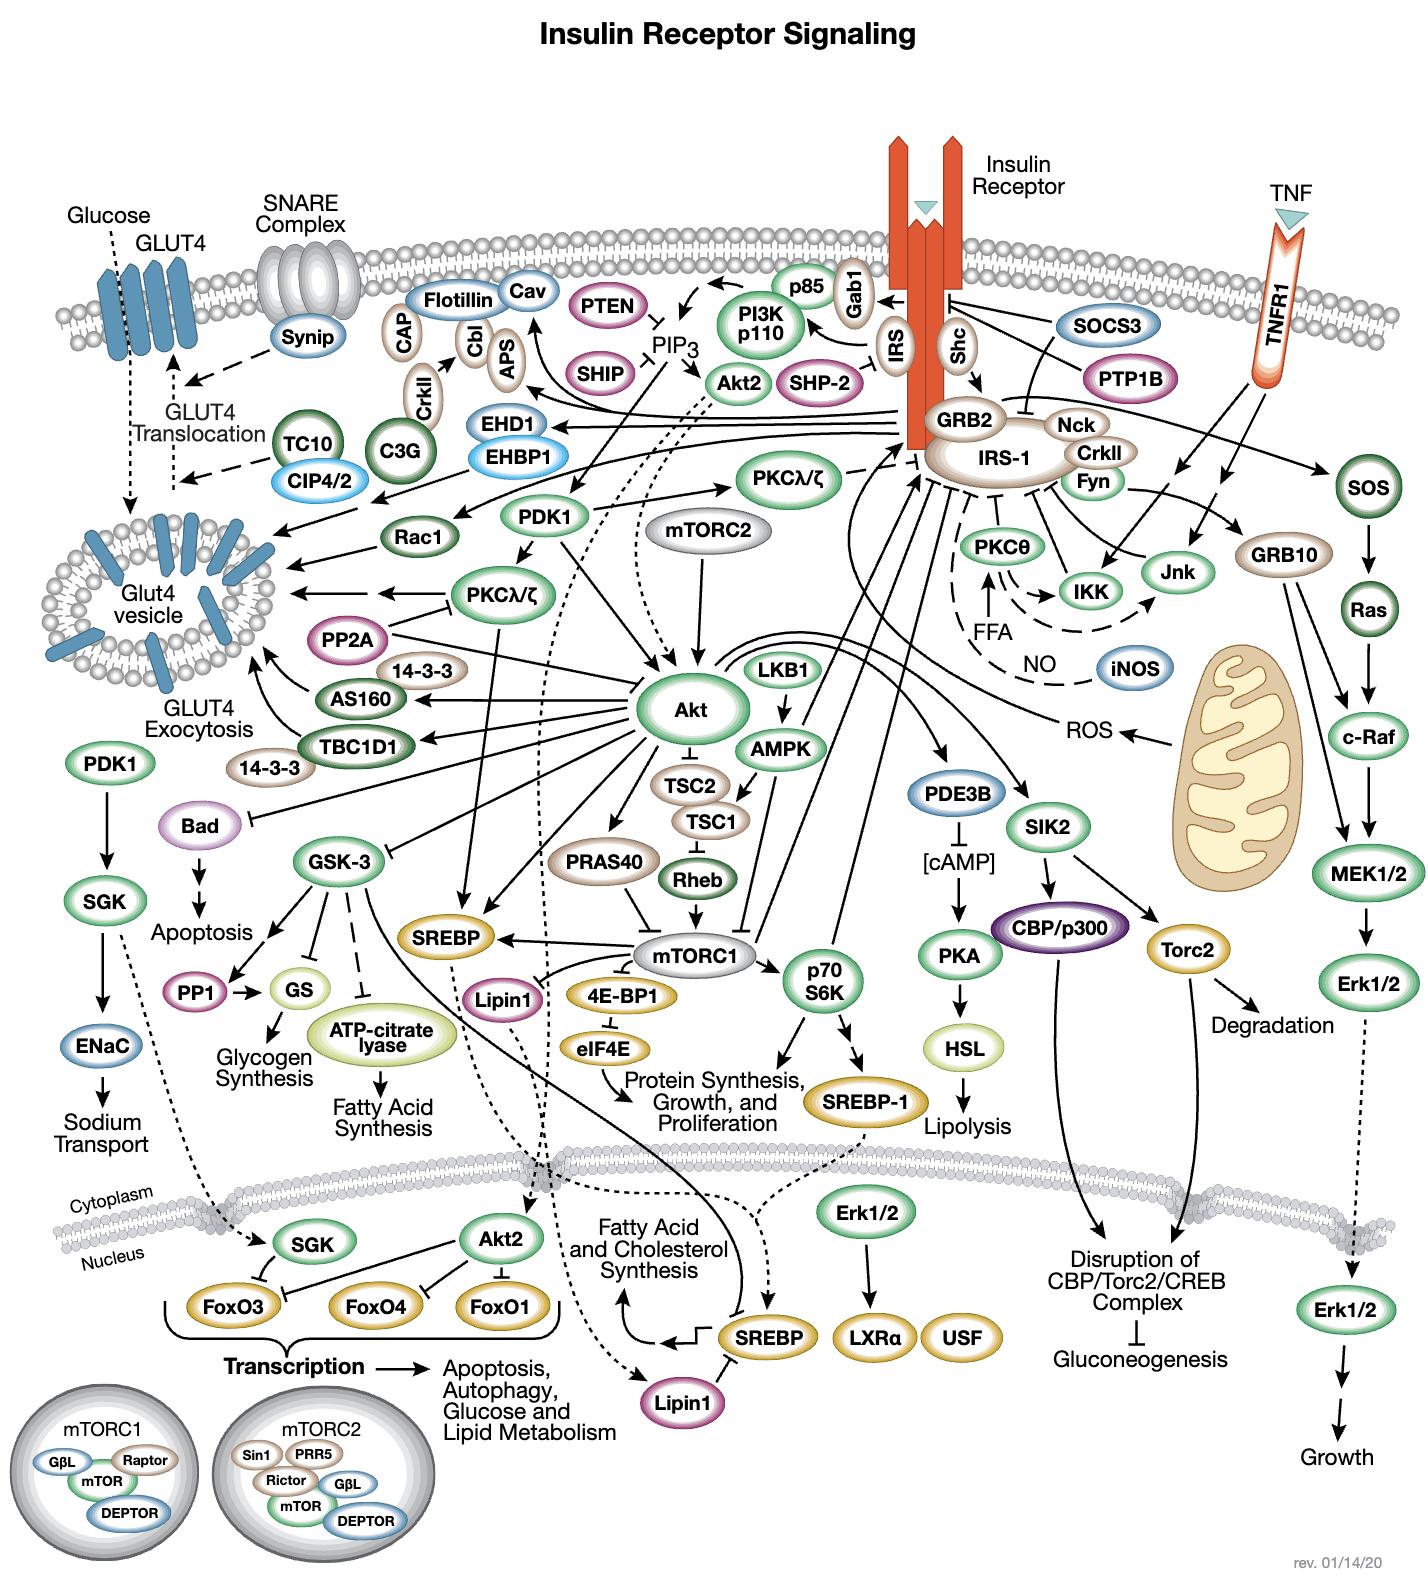 Insulin Receptor Signaling Interactive Pathway